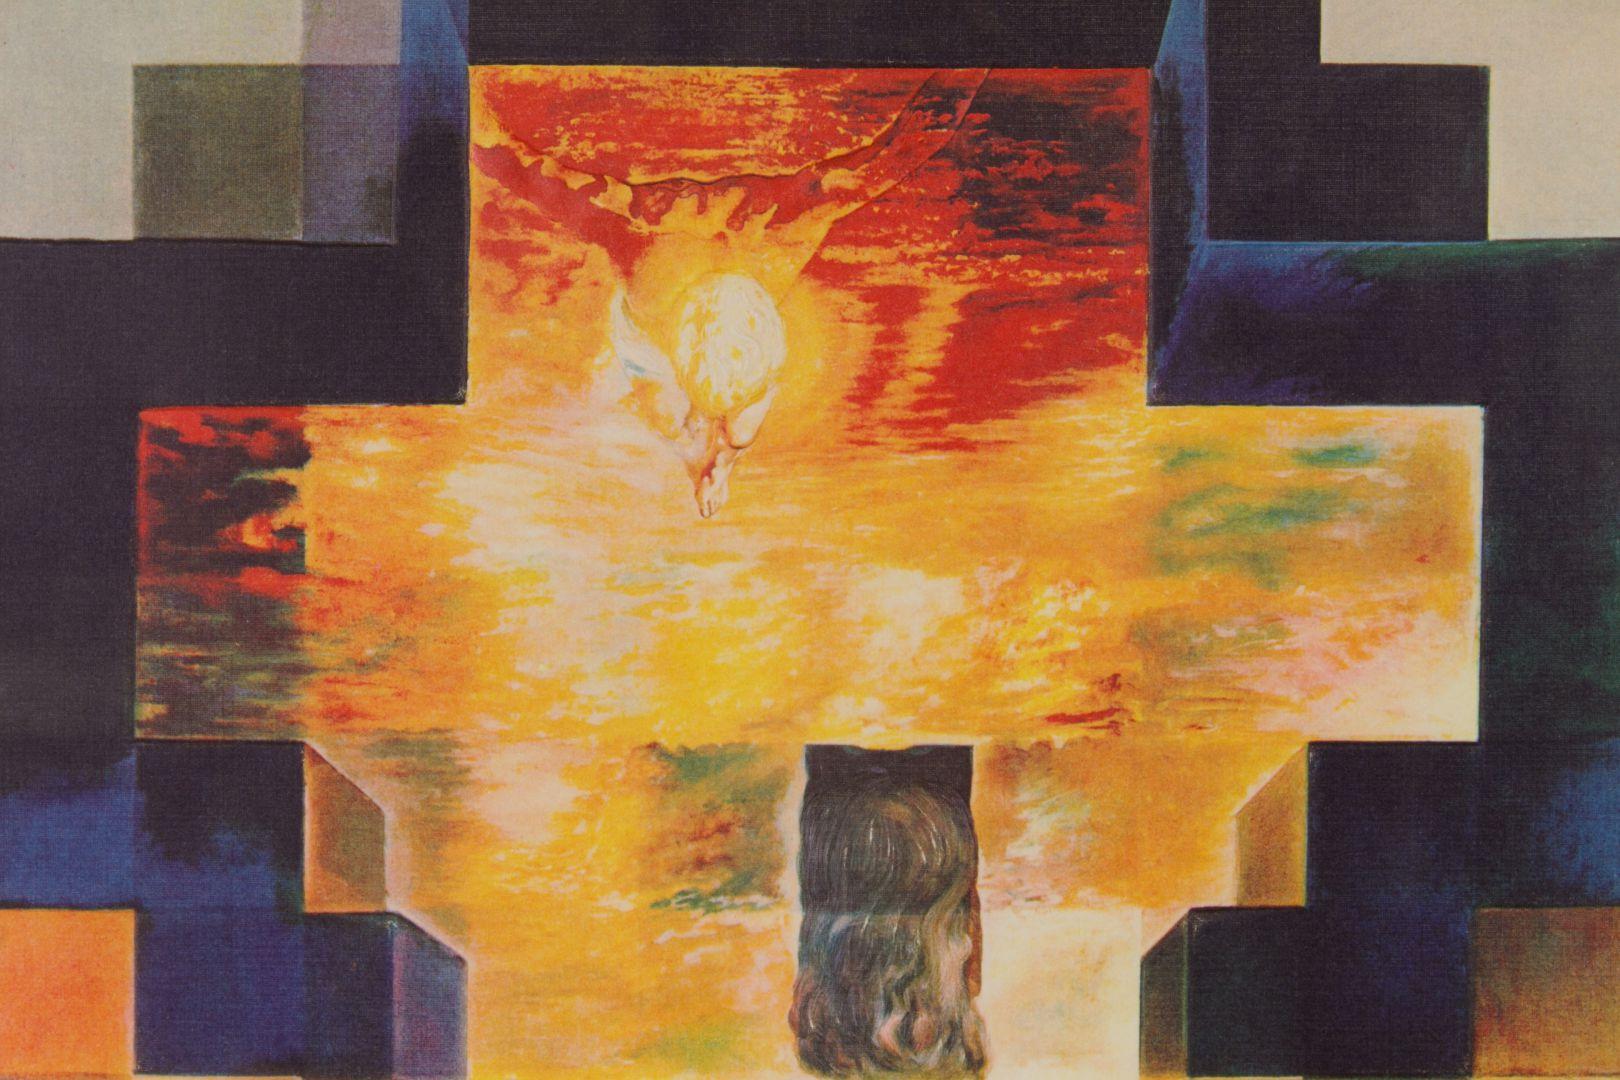 SALVADOR DALI (1904-1989) GALA NUDE (ABRAHAM LINCOLN